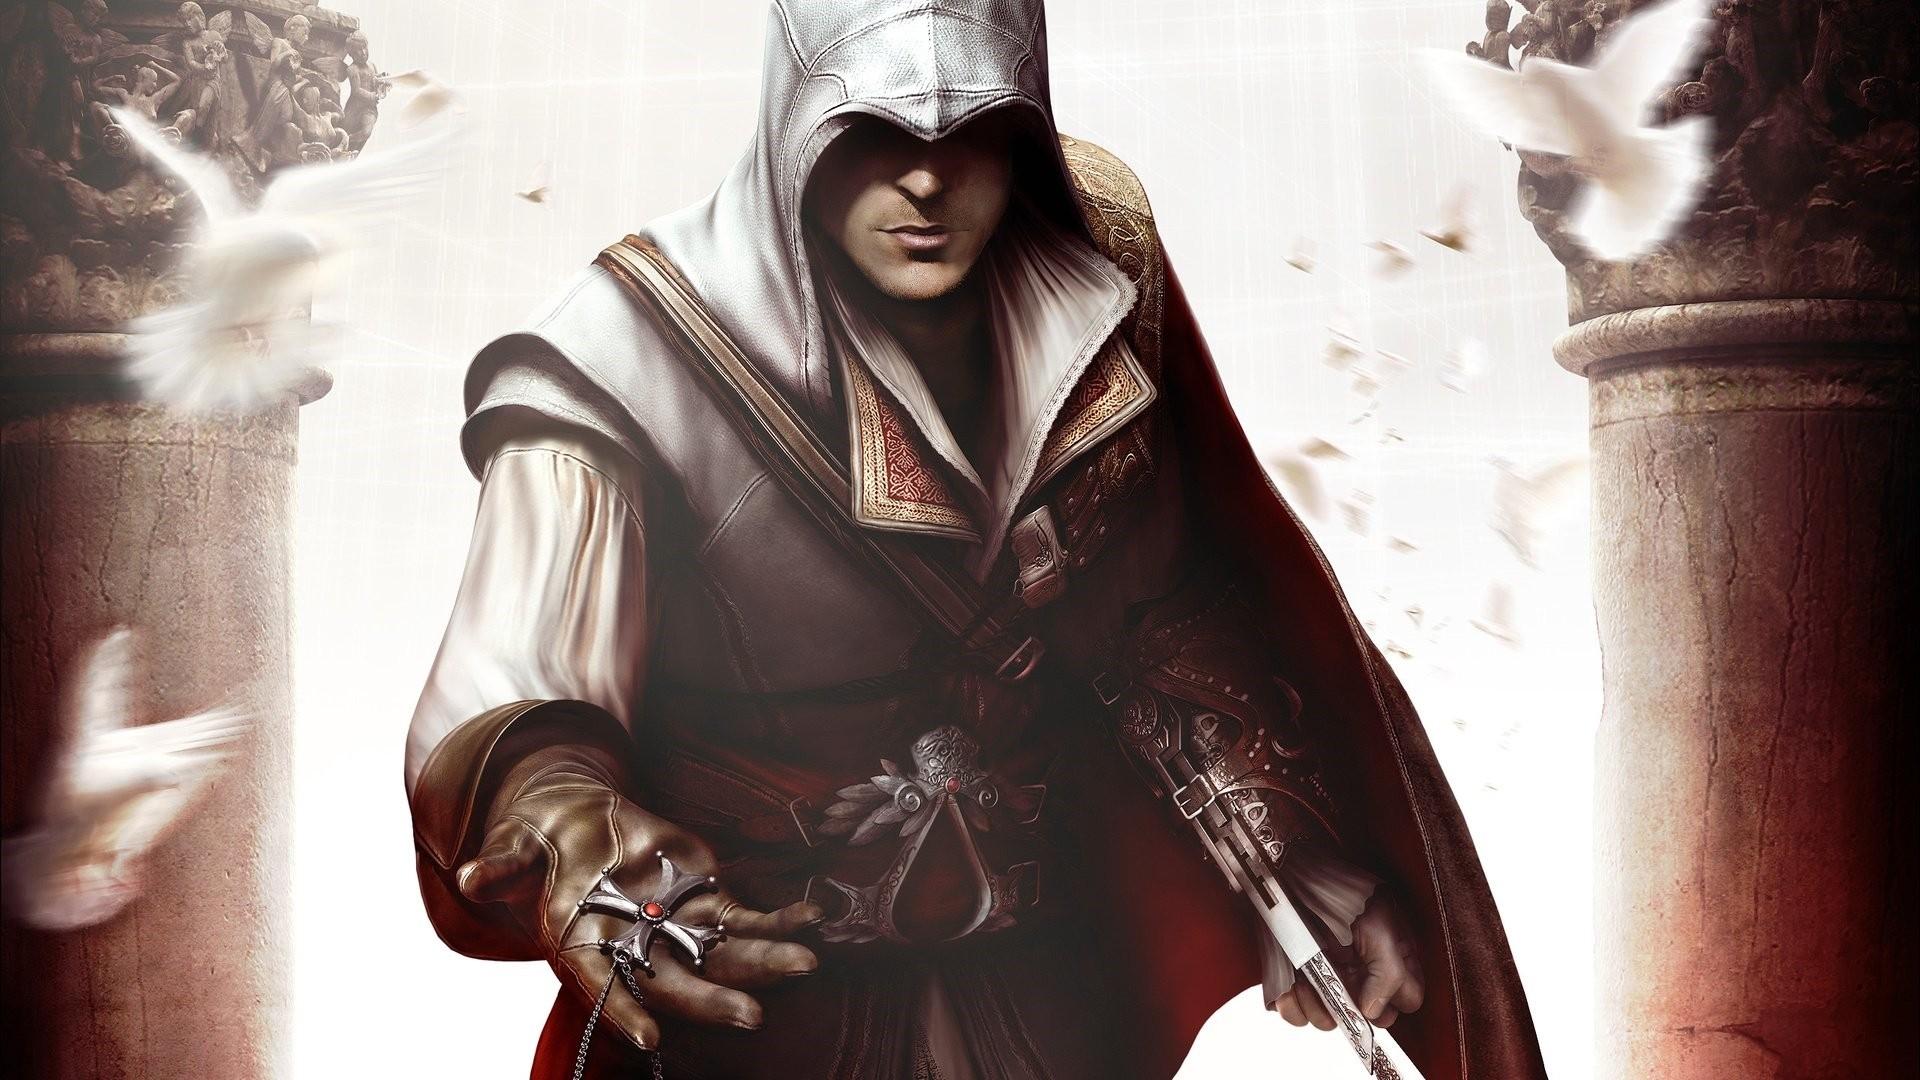 Assassin's Creed 2 Wallpaper Download